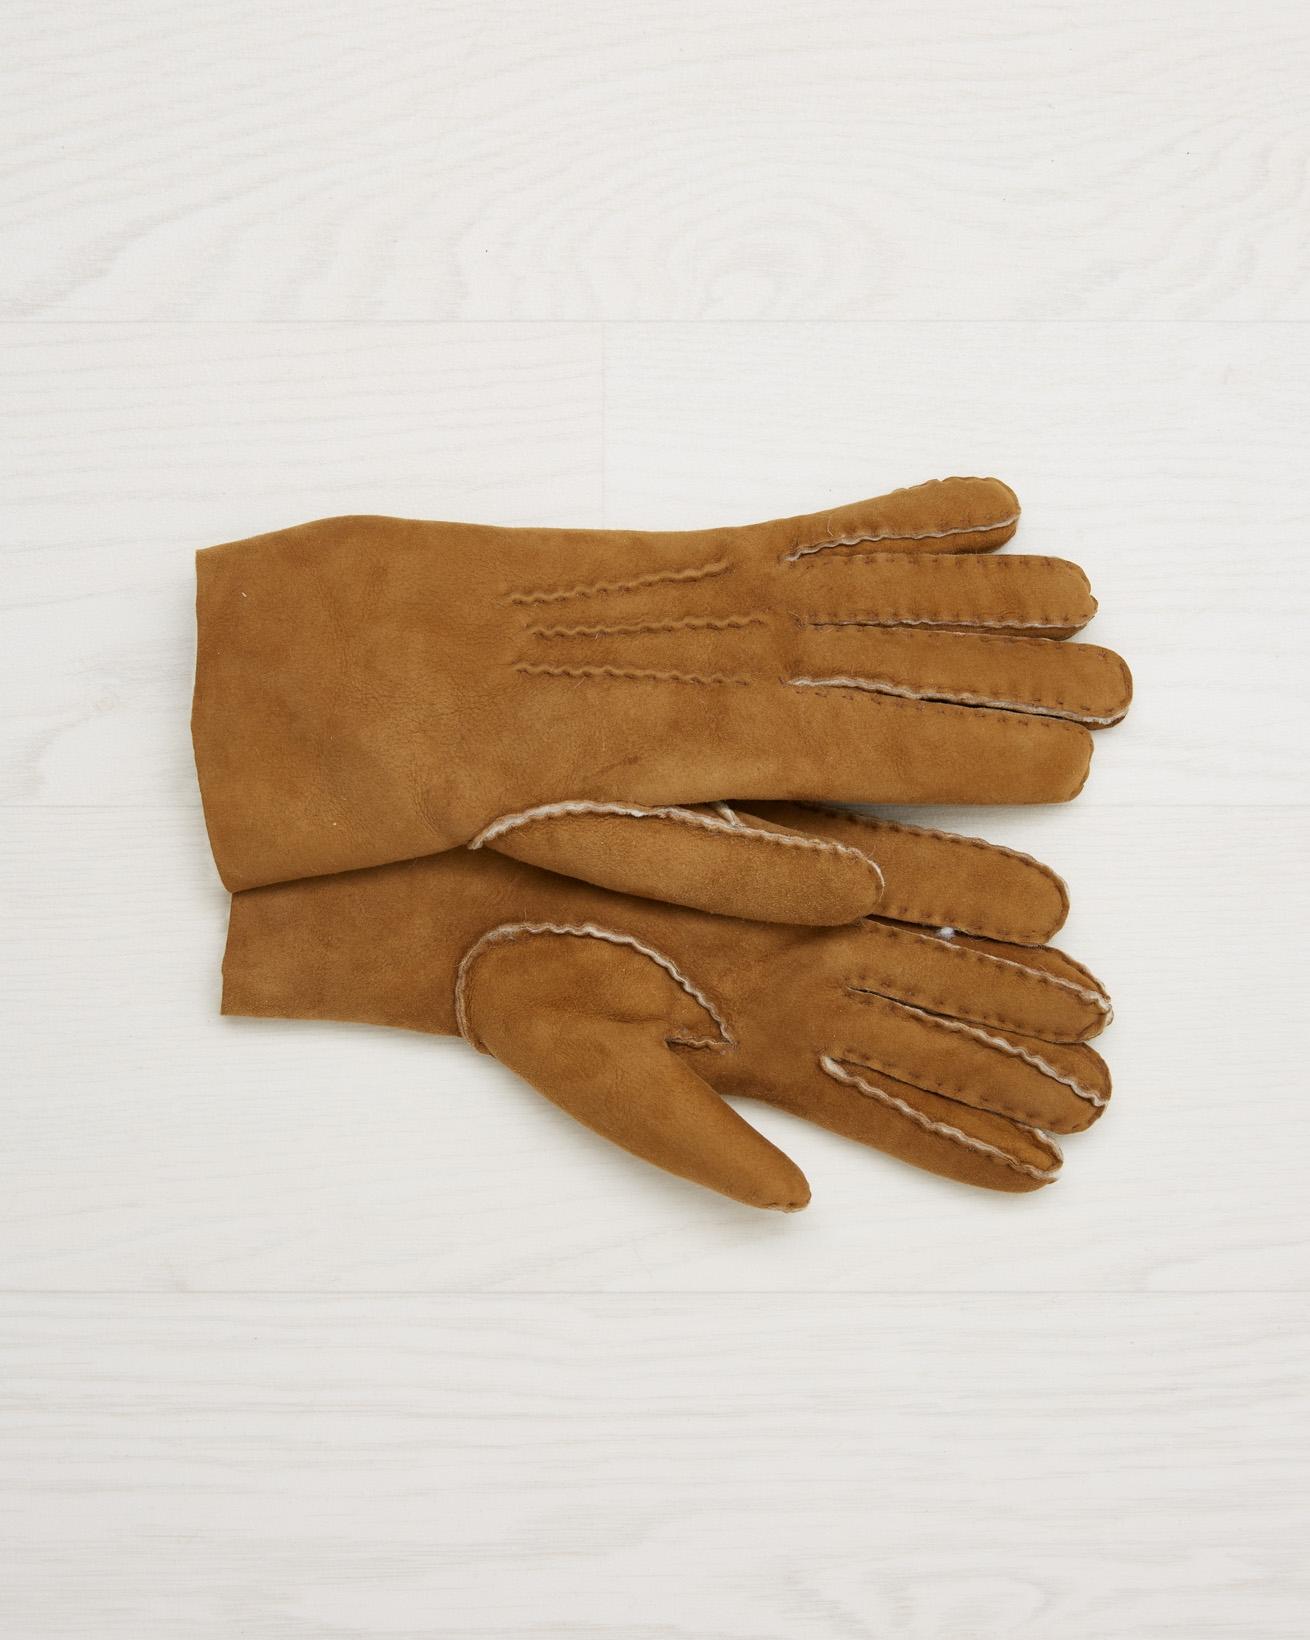 Sheepskin Gloves - Spice - Size Small - 2560